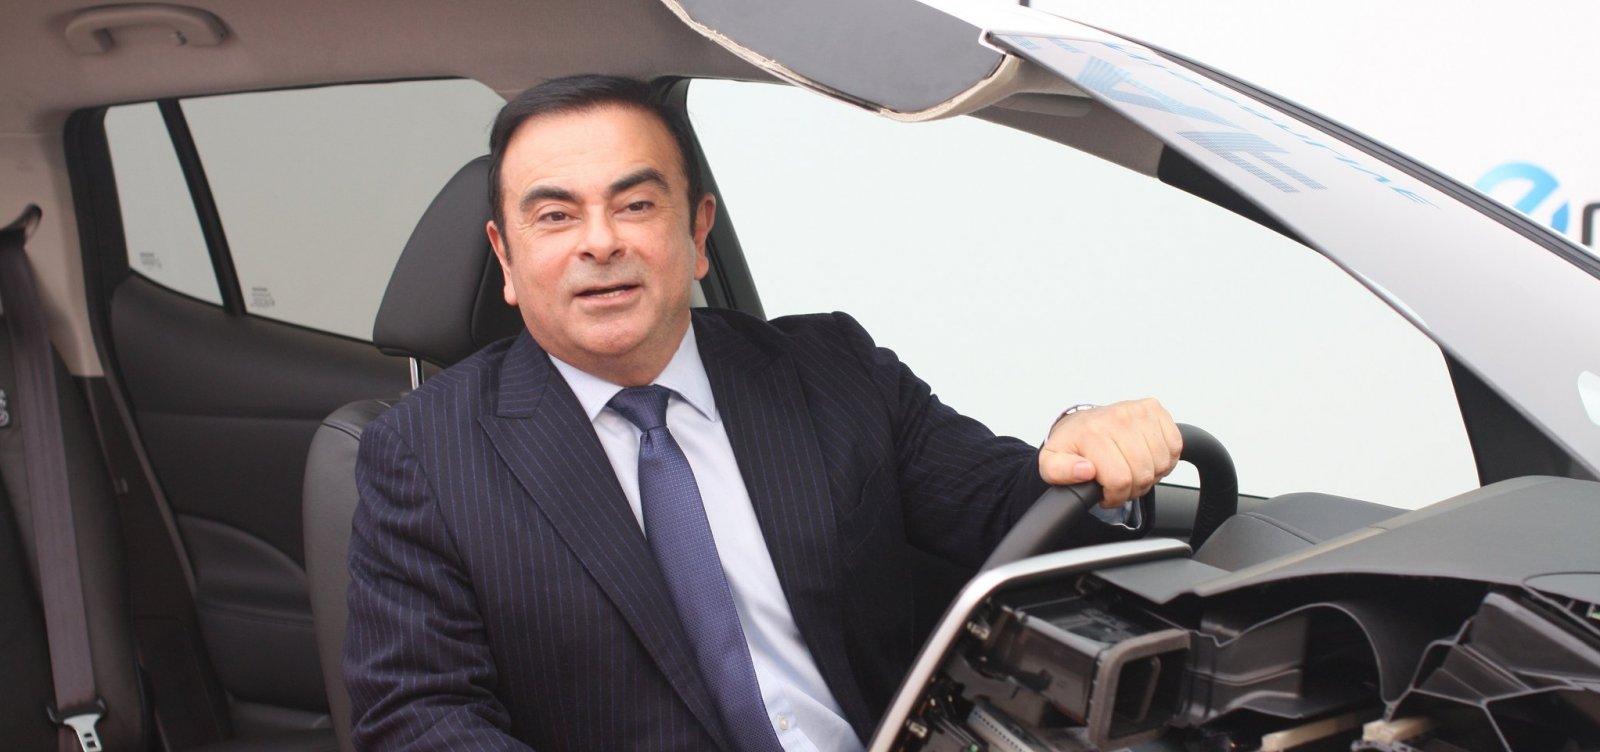 [Justiça autoriza família de Carlos Ghosn a recuperar bens no Rio]